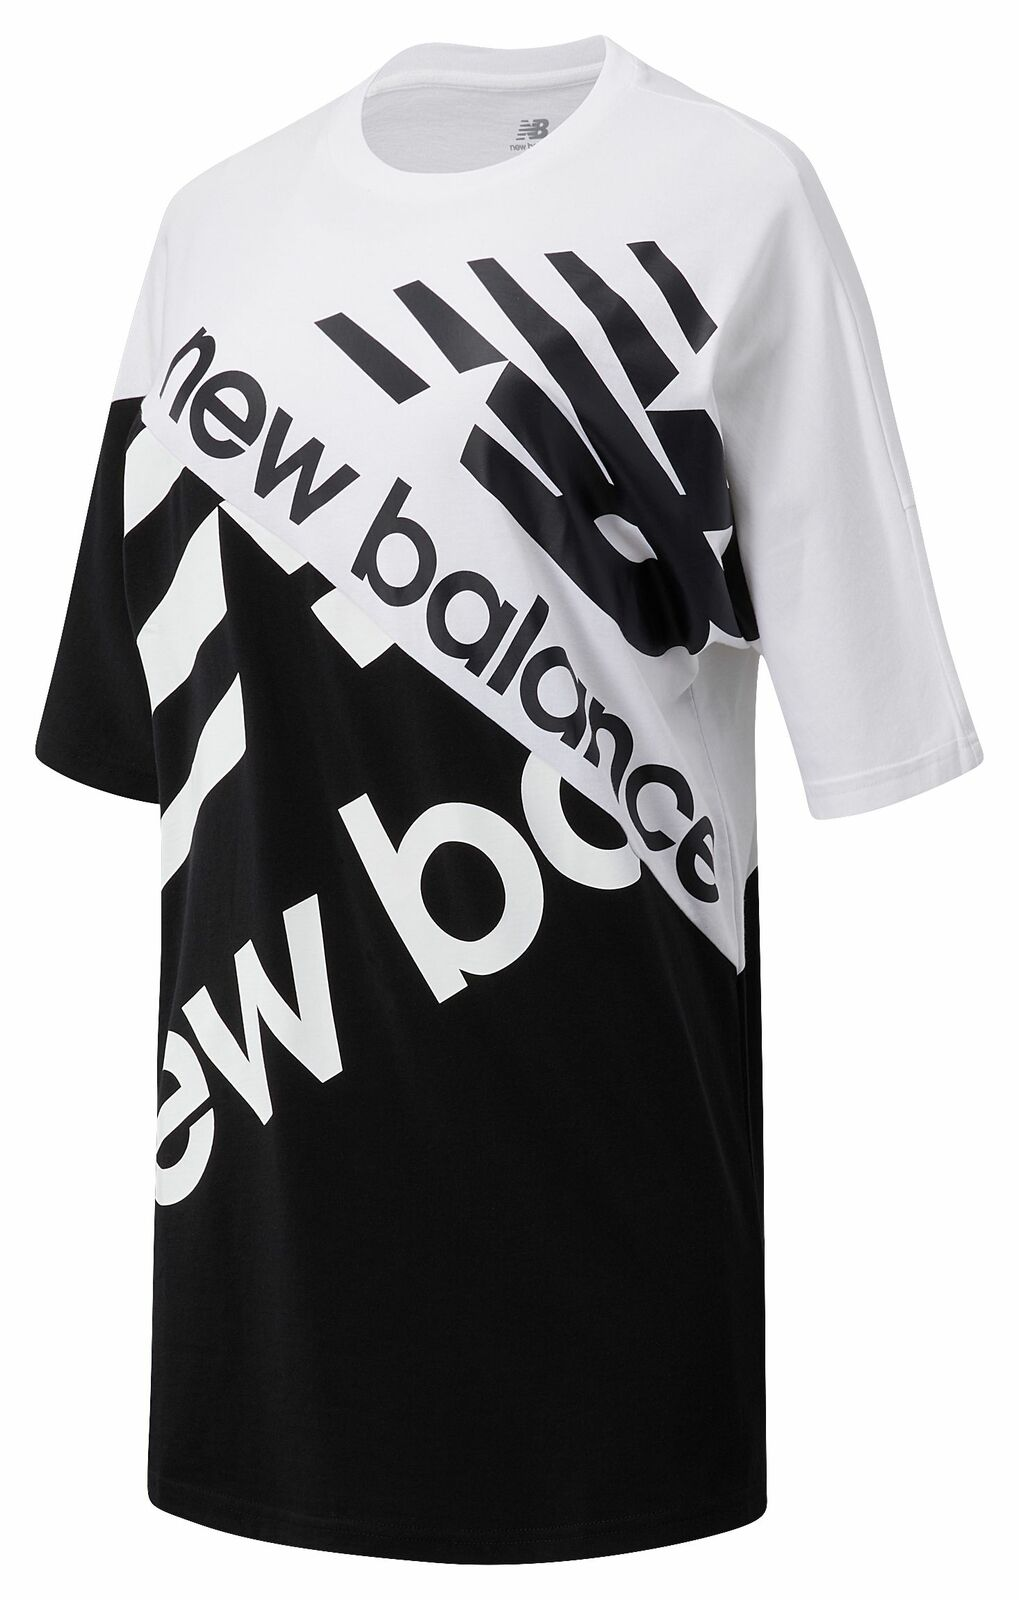 New Balance Women's NB Athletics Splice Tunic Tee Black with Grey